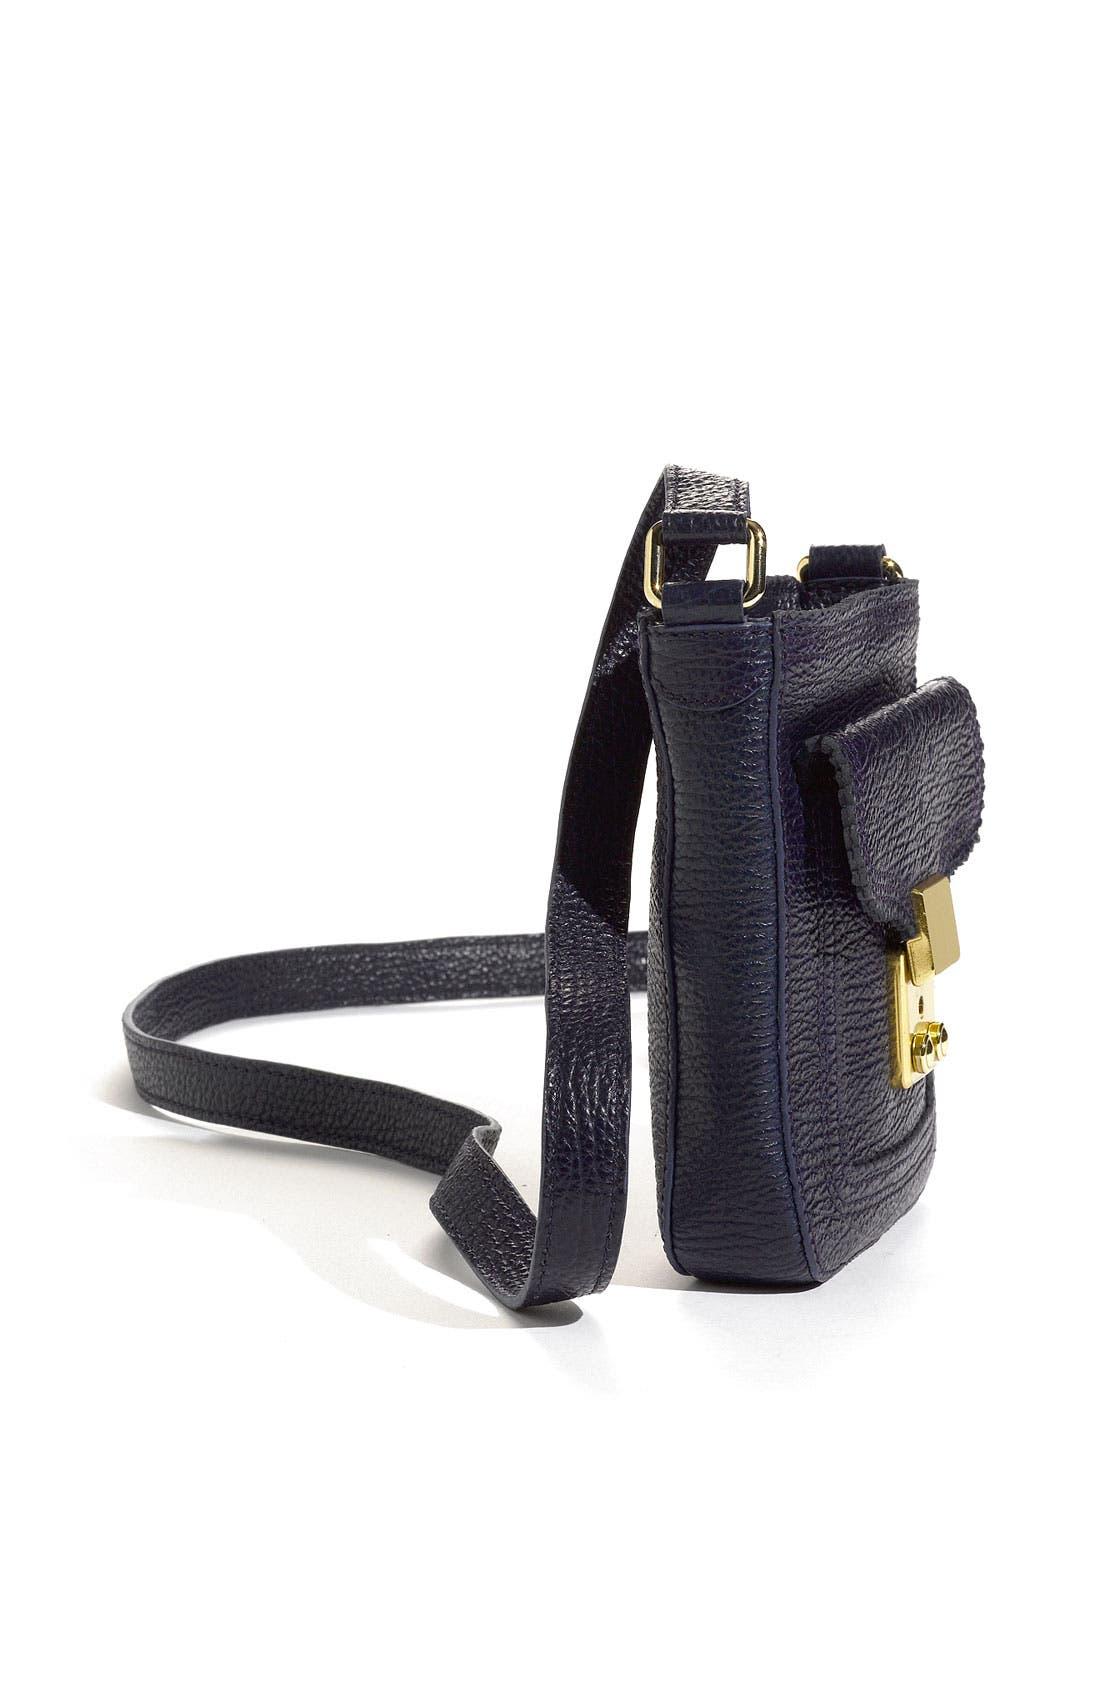 Alternate Image 2  - 3.1 Phillip Lim 'Pashli Camera' Textured Calfskin Crossbody Bag